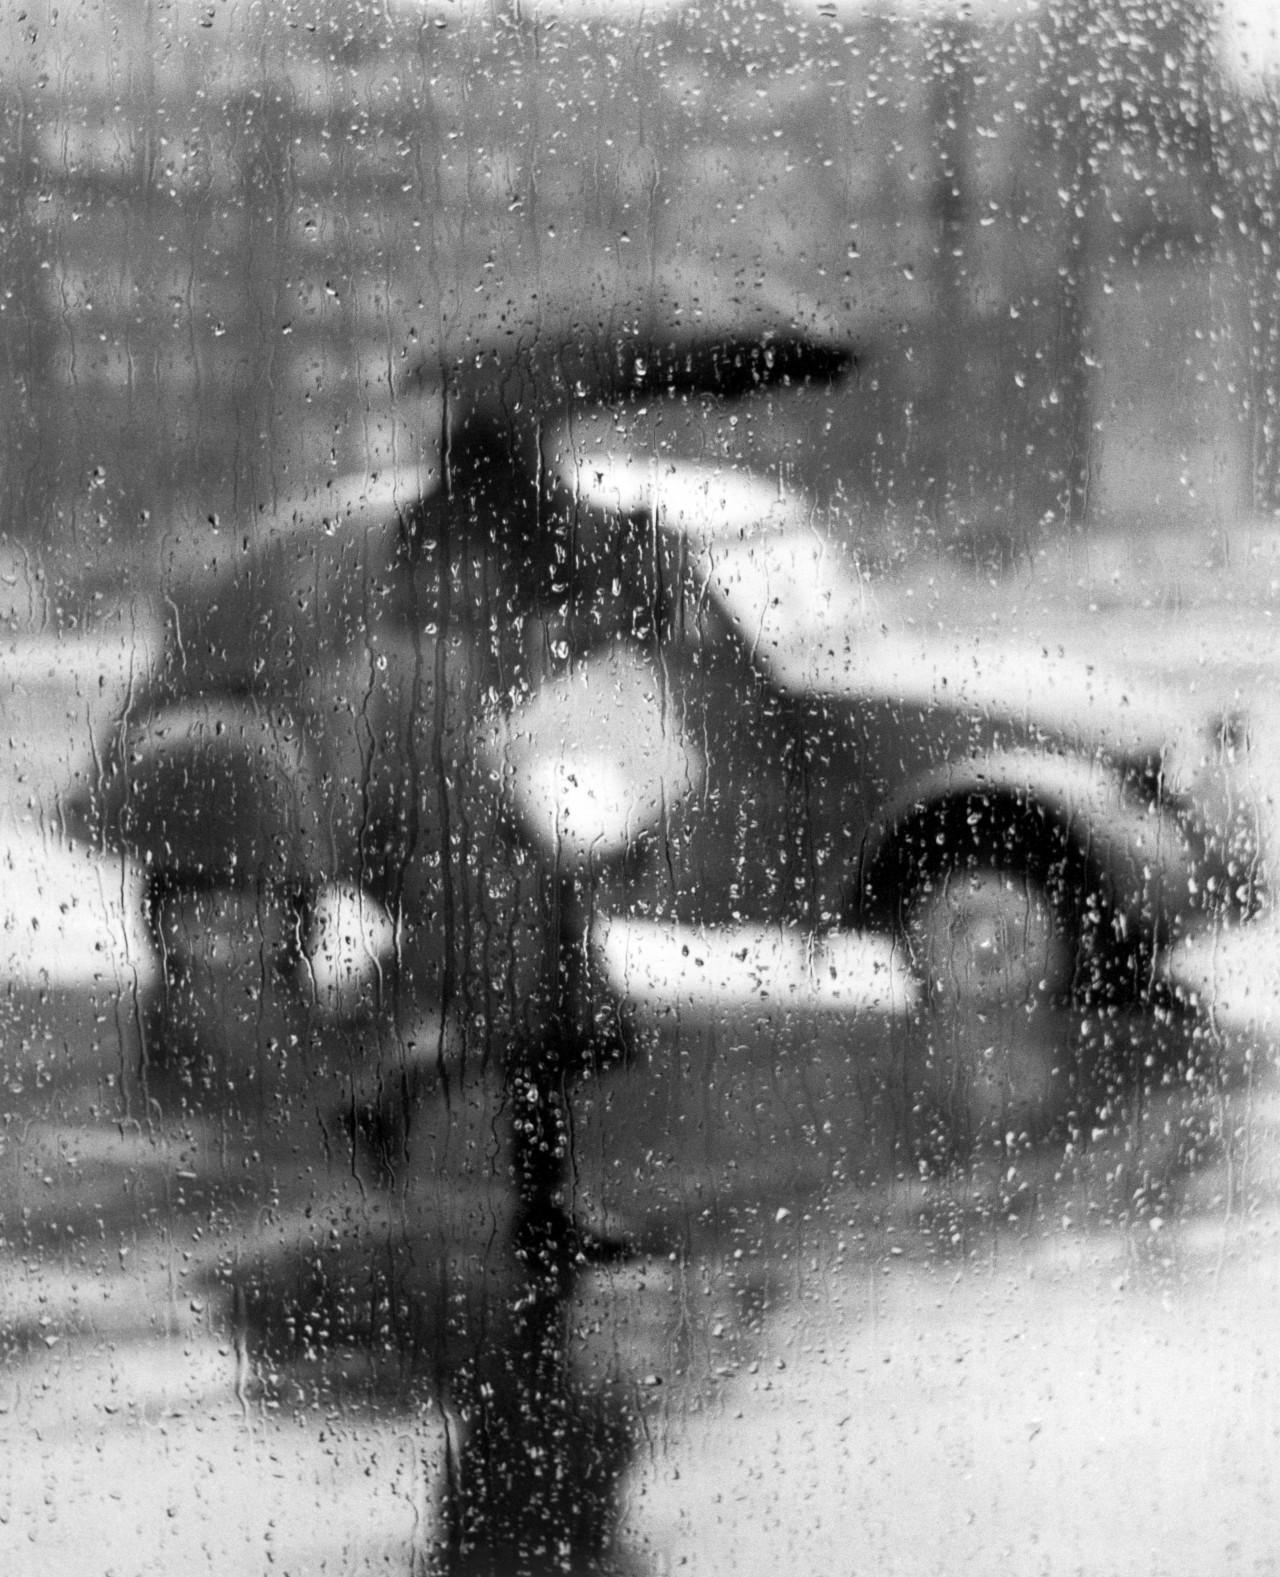 Под дождем, Париж, 1957. Фотограф Сабина Вайс